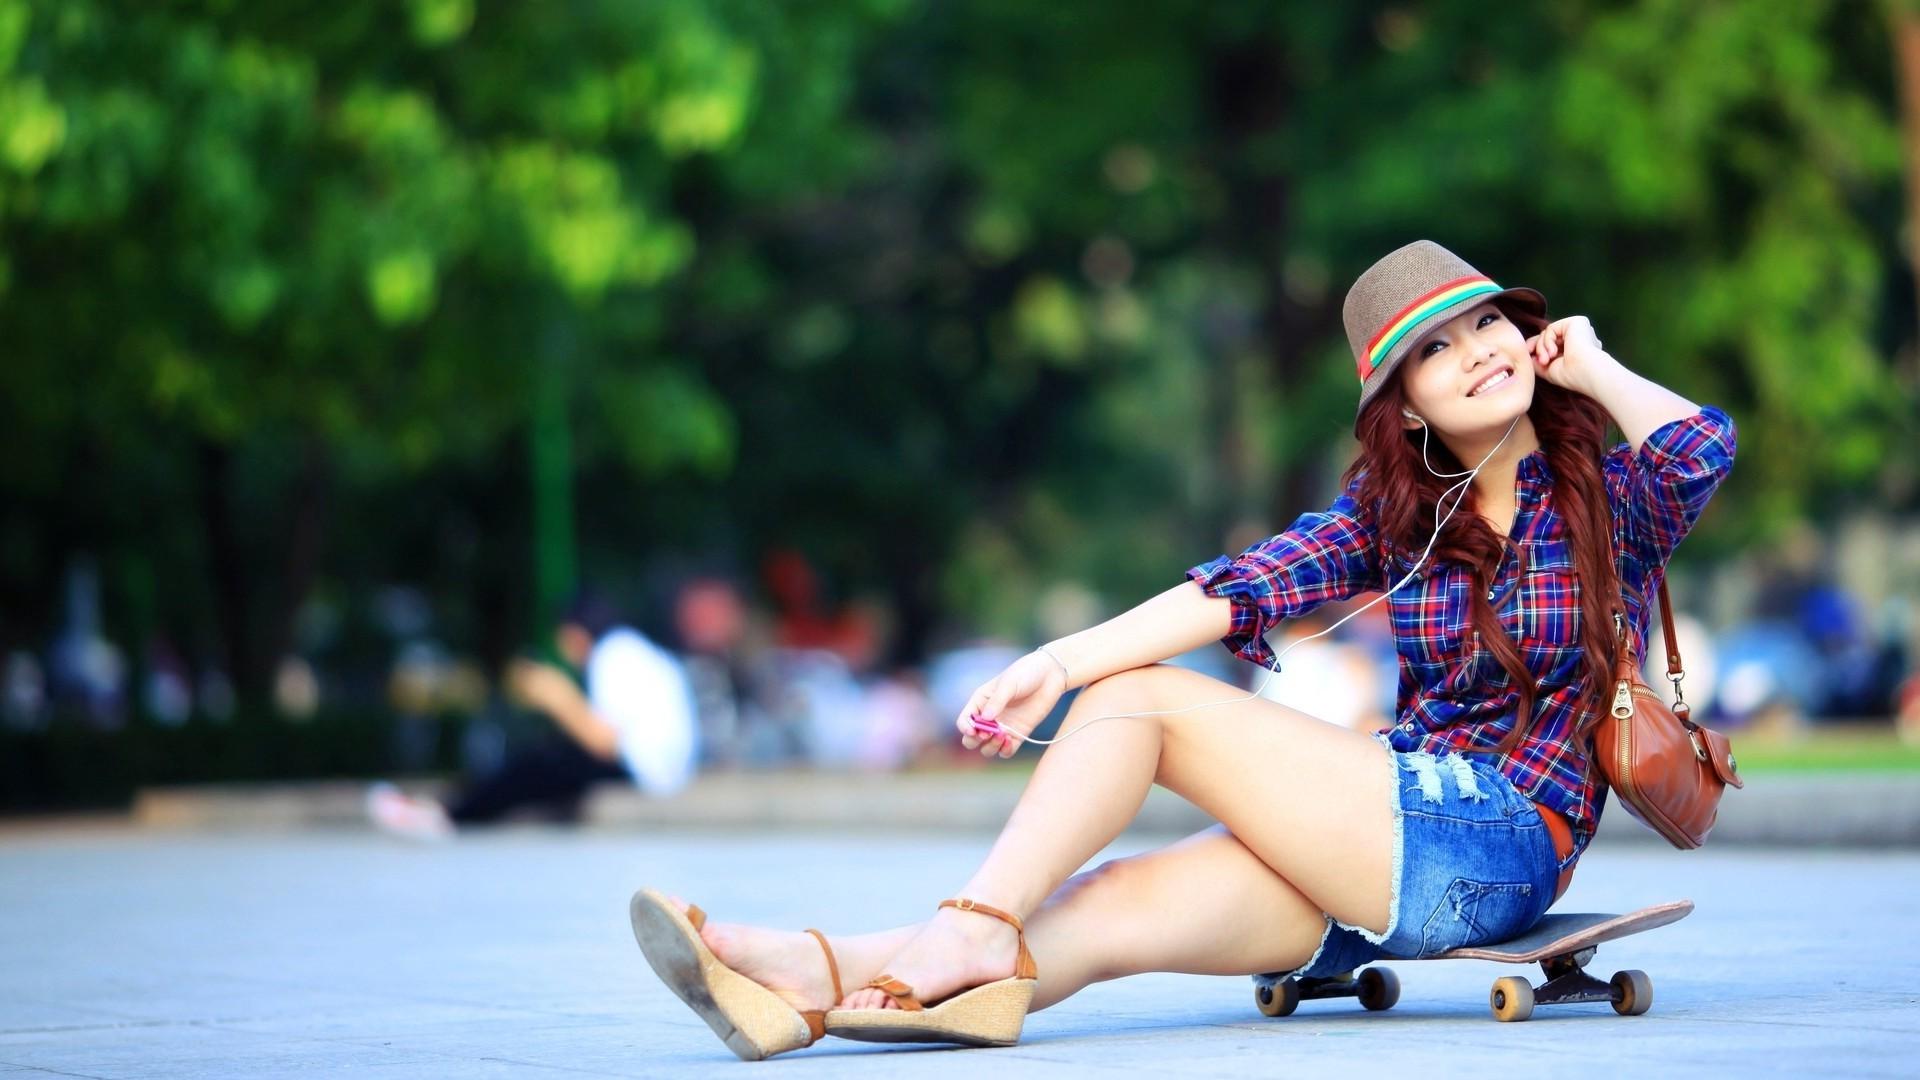 Wallpaper  Women, Model, Asian, Sitting, Smiling, Feet, Fashion, Skateboard, Spring -6437